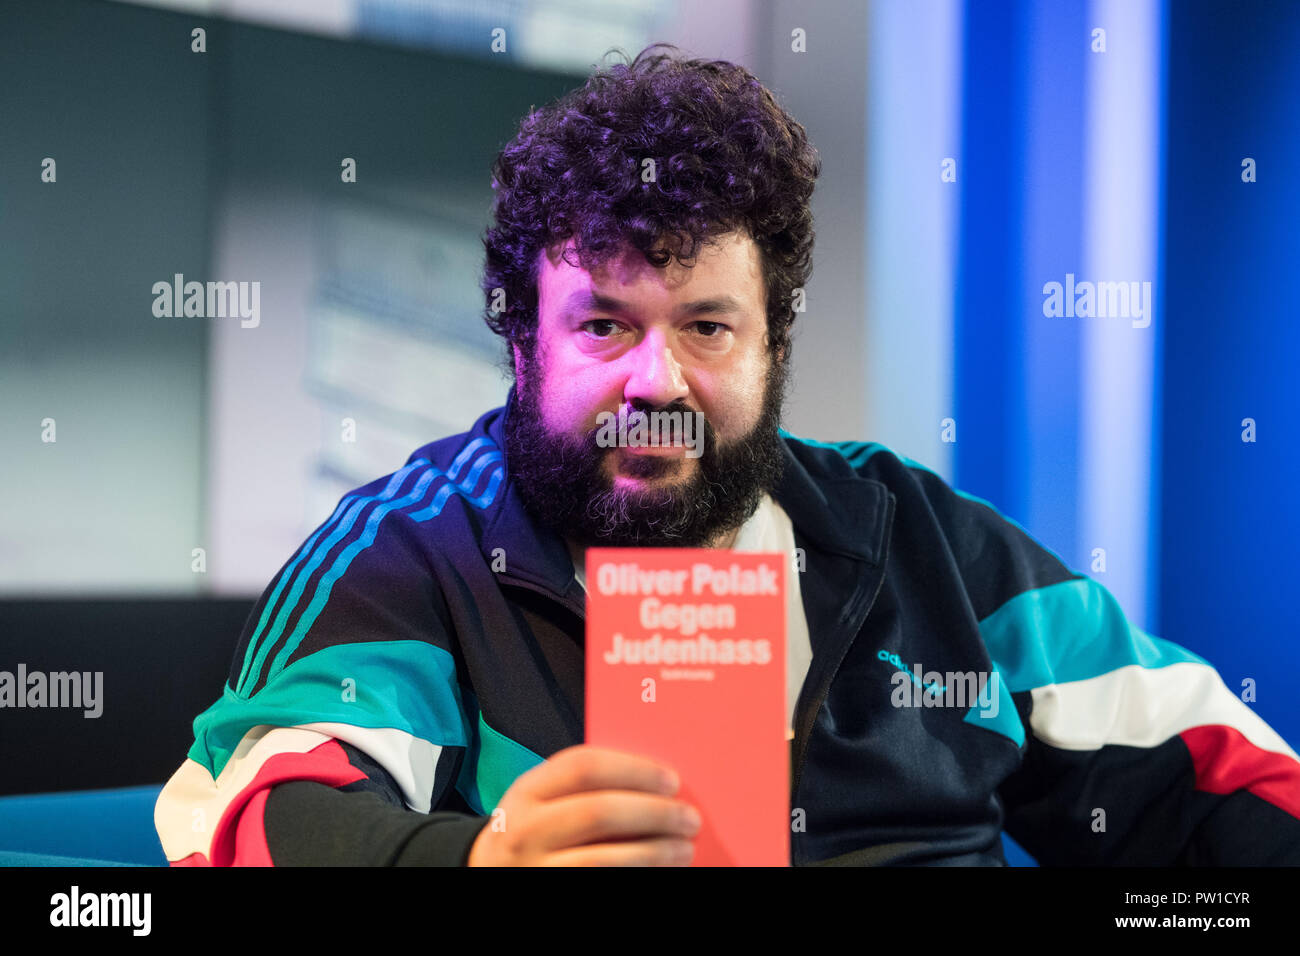 Oliver POLAK, Author, Comedian, Portrait, during the TV program 'Das blaue Sofa' at the Frankfurt Book Fair 2018 on 10.10.2018, Frankfurt Book Fair 2018 from 10.10 - 14.10.2018 in Frankfurt am Main / Germany.   Usage worldwide - Stock Image